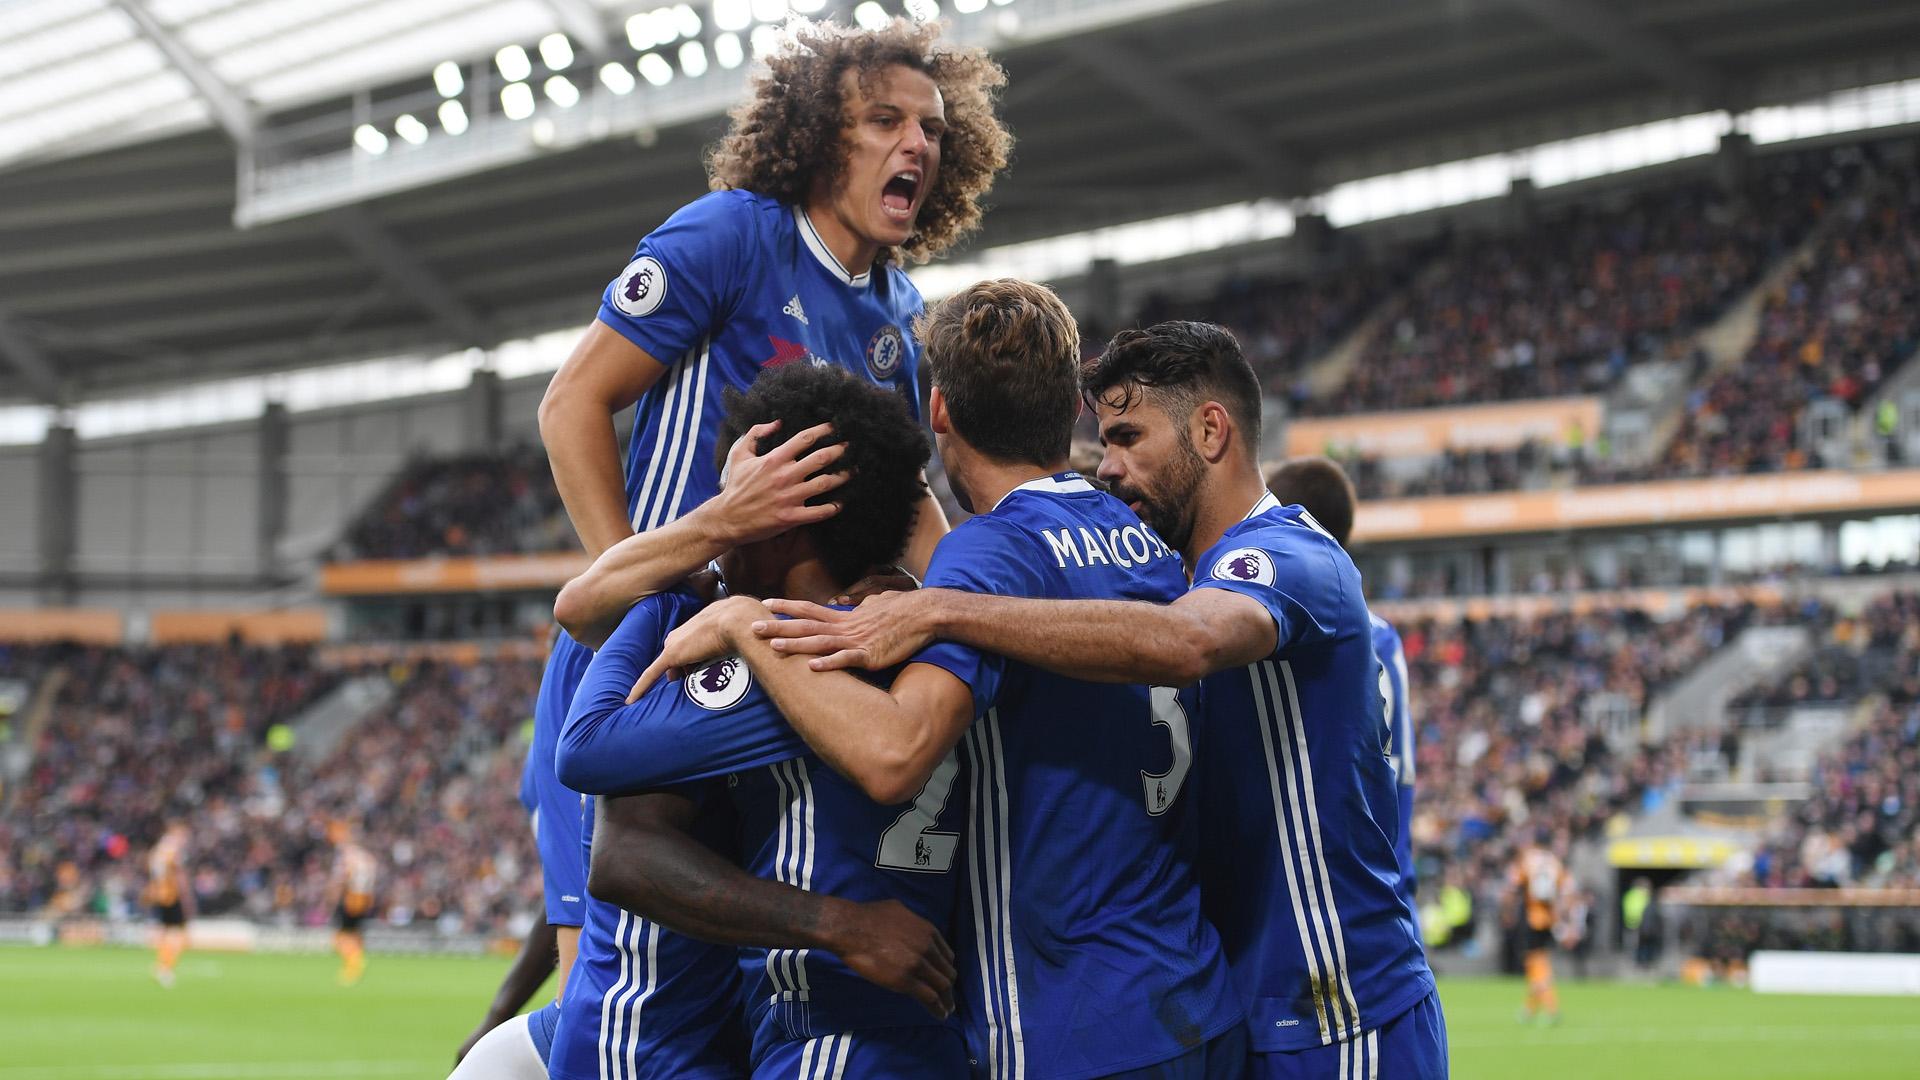 Agen Taruhan Bola - Hasil Pertandingan Chelsea vs Everton